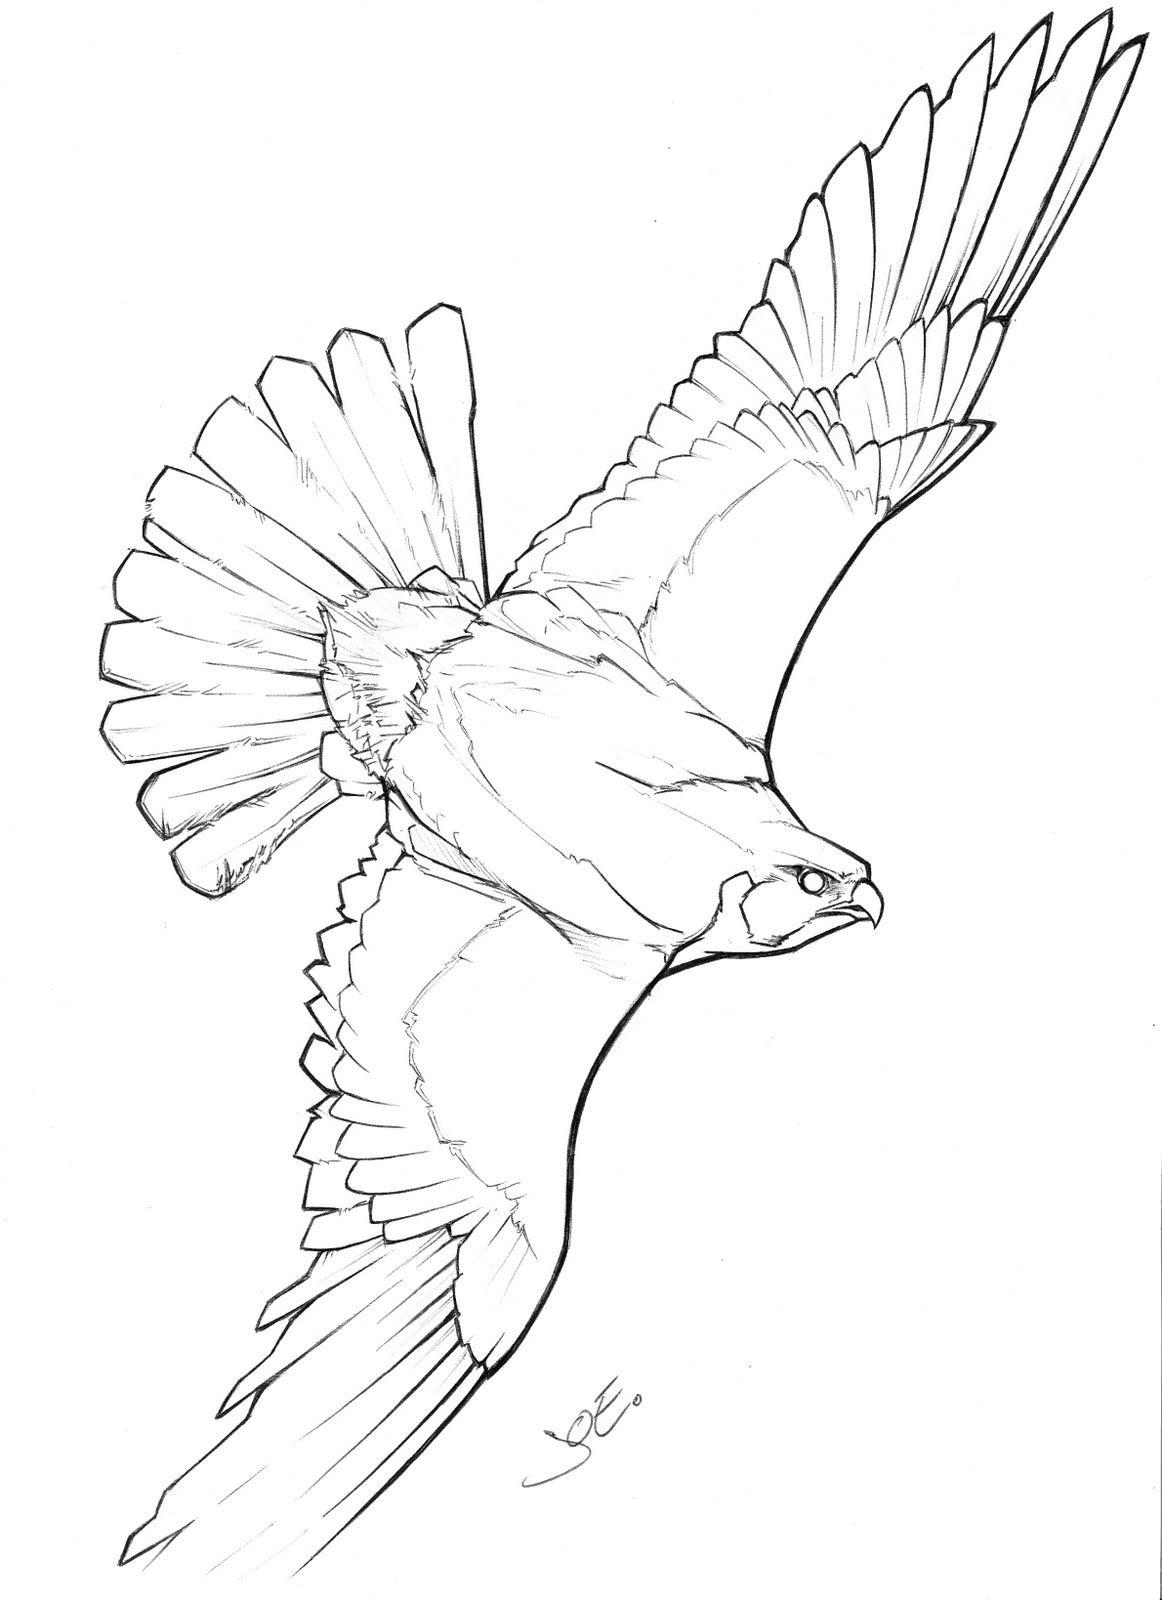 flying falcon drawing - HD1162×1600